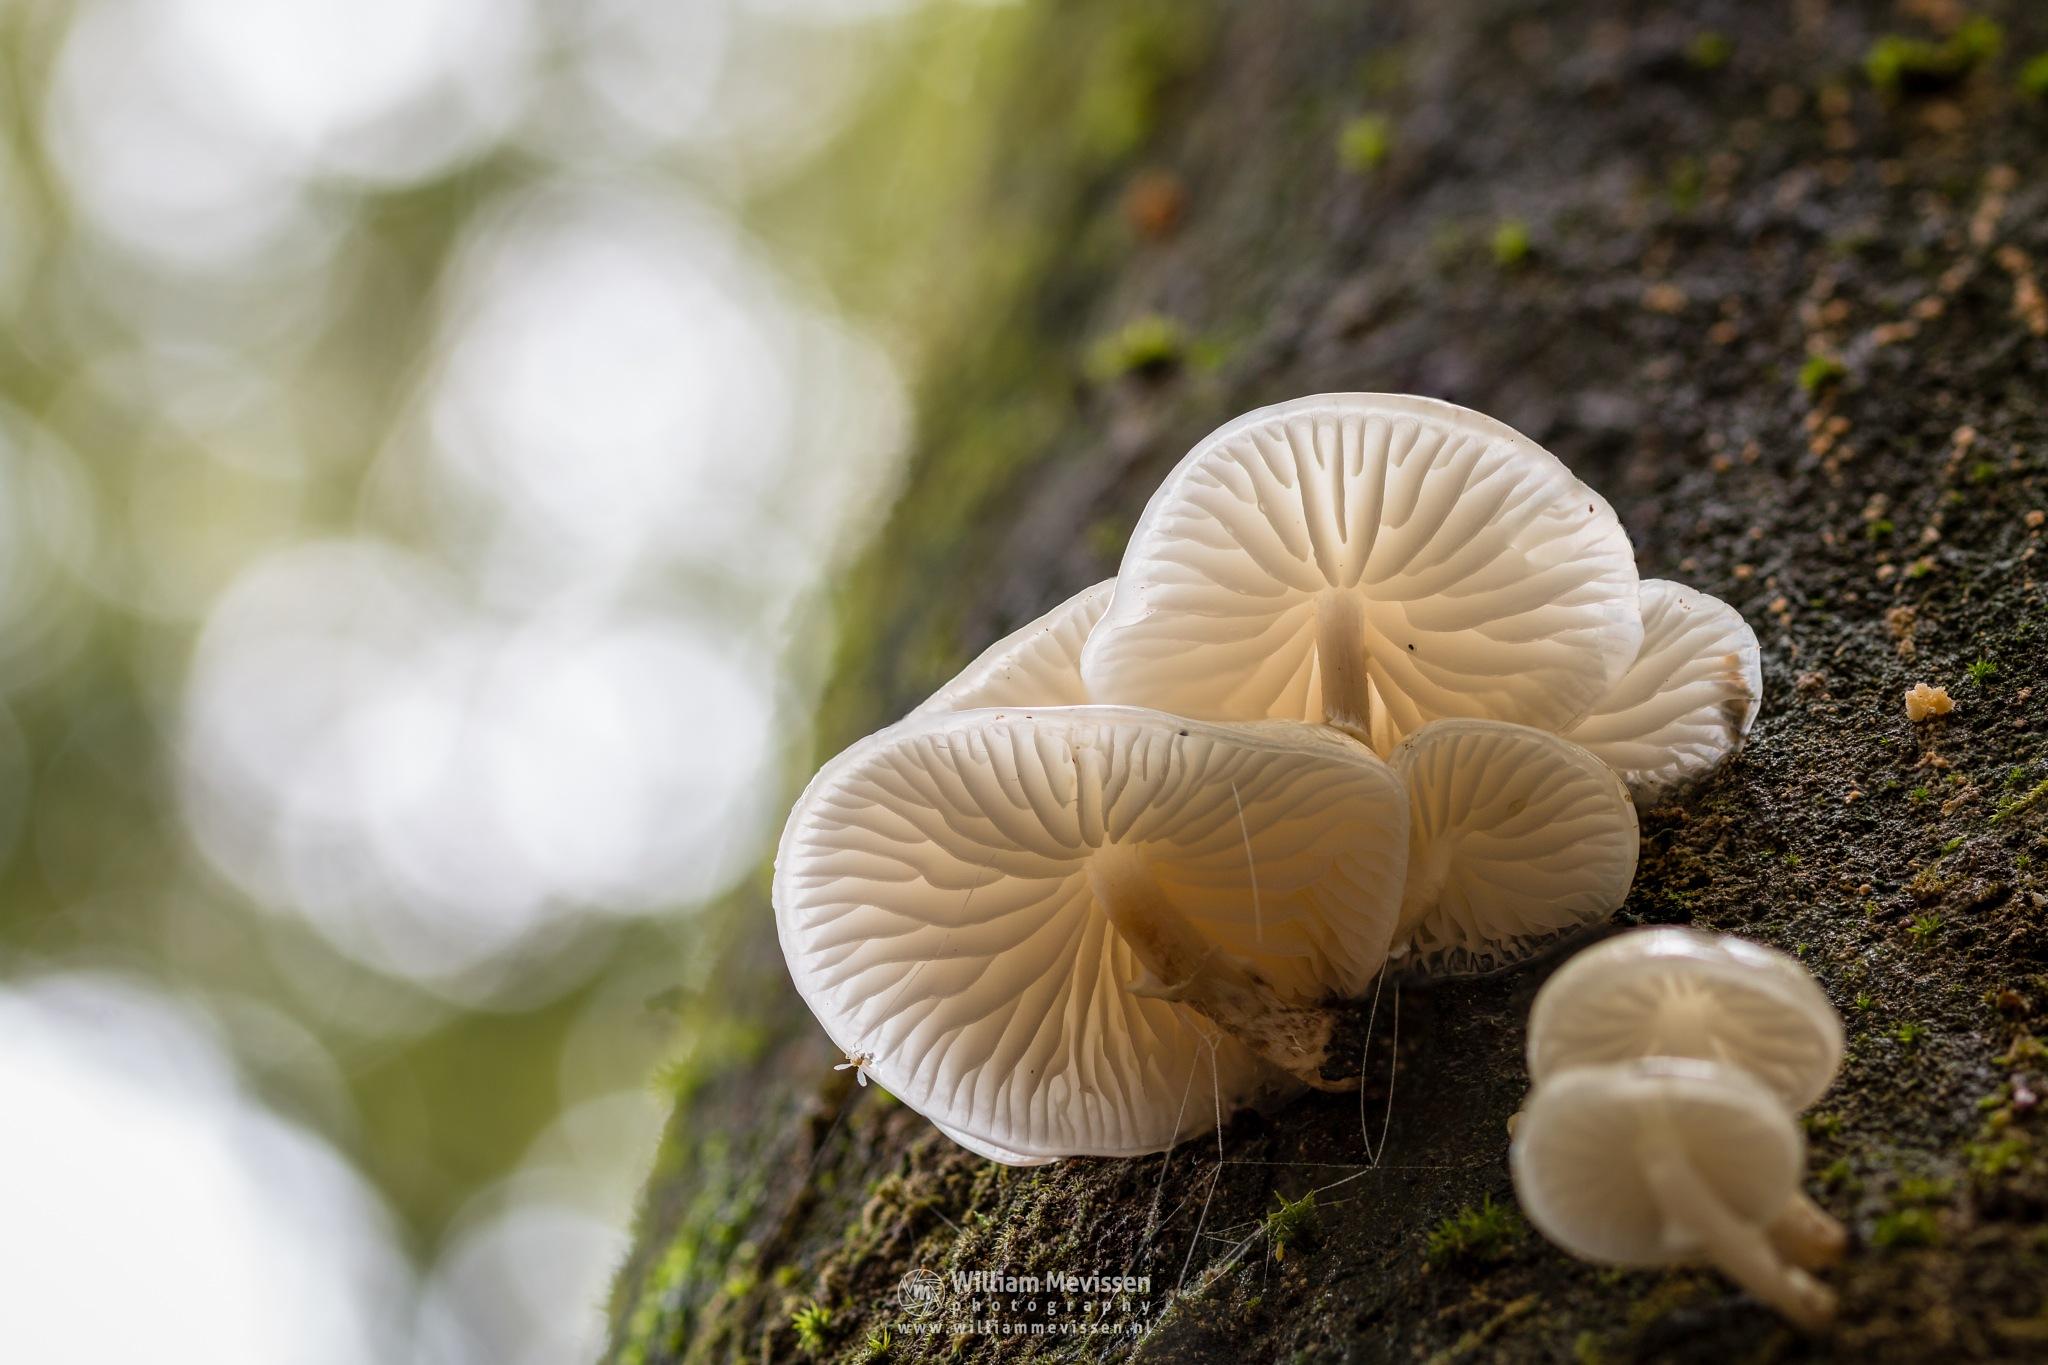 Porcelain Fungus by William Mevissen